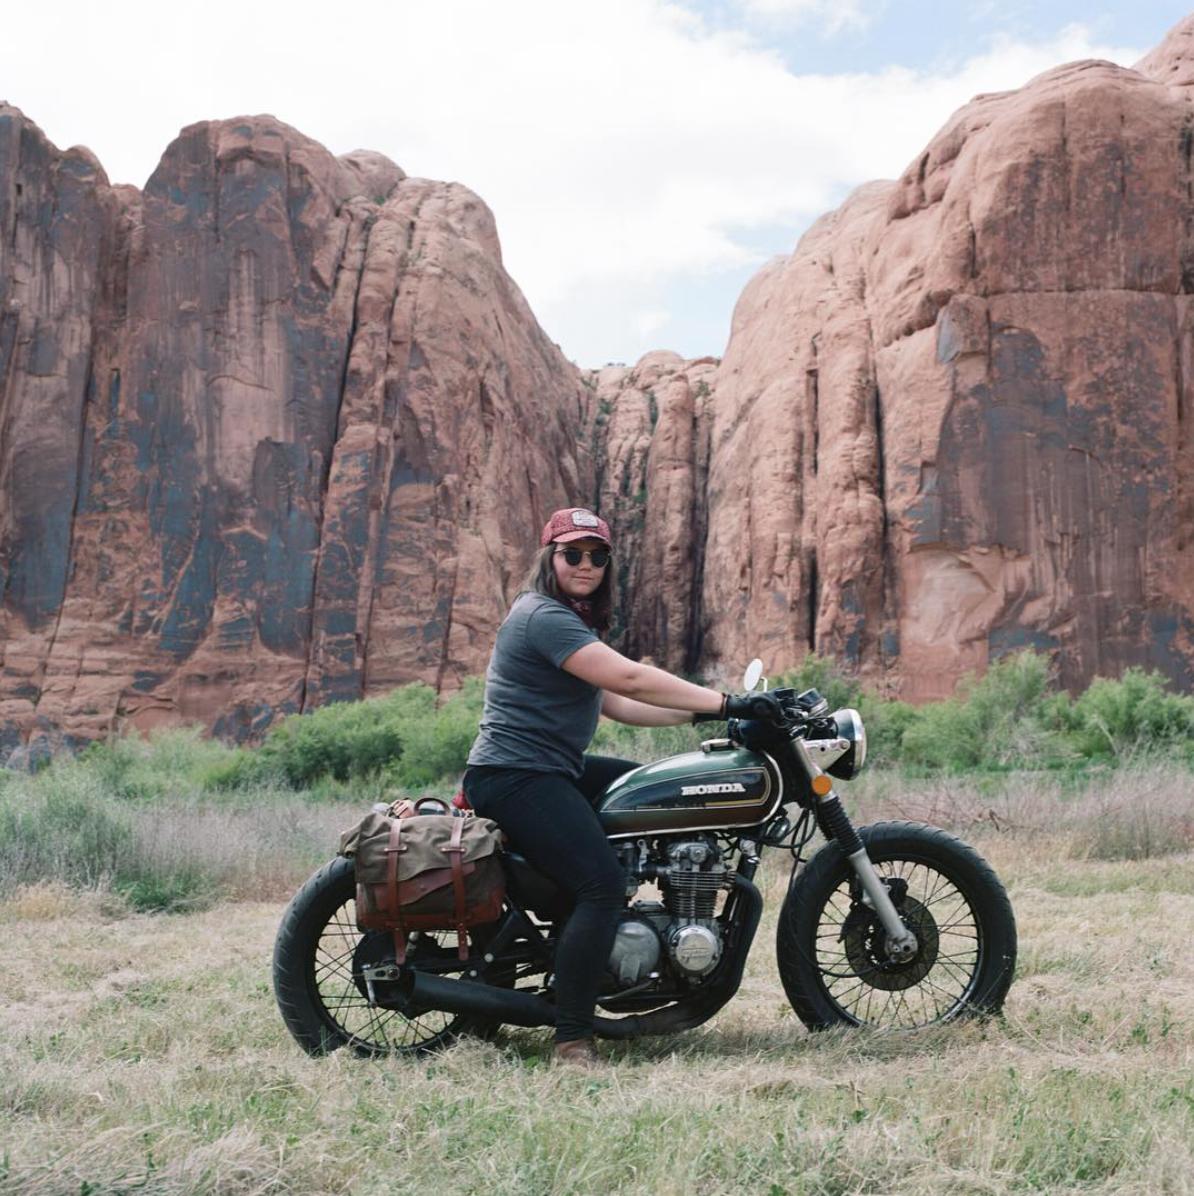 WomensMotoExhibit, les femmes peuvent aussi être badass en moto